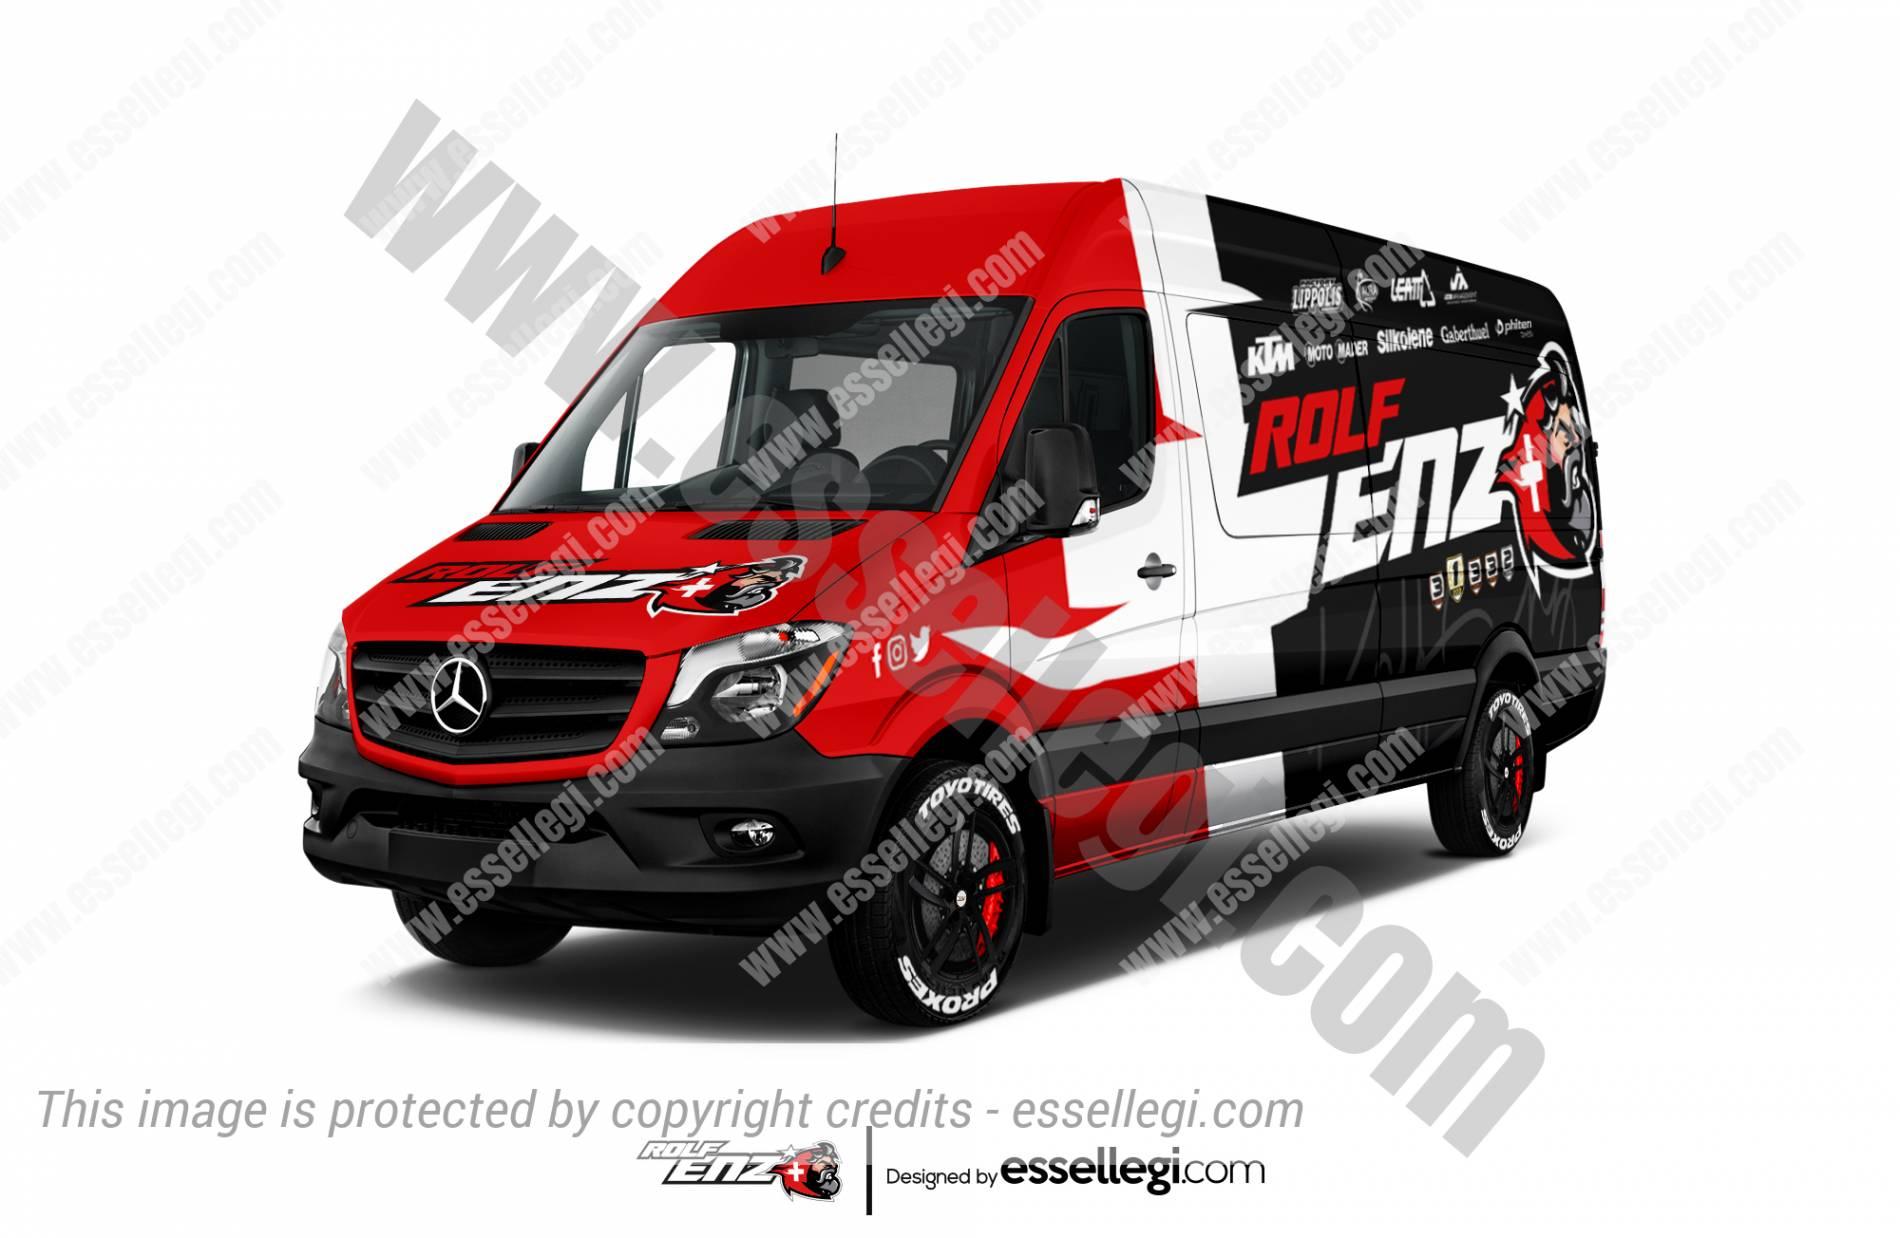 Mercedes Sprinter Wrap Design. Mercedes Sprinter | Van Wrap Design by Essellegi. Van Signs, Van Signage, Van Wrapping, Van Signwriting, Van Wrap Designer, Signs for Van, Van Logo, Van Graphic by Essellegi.